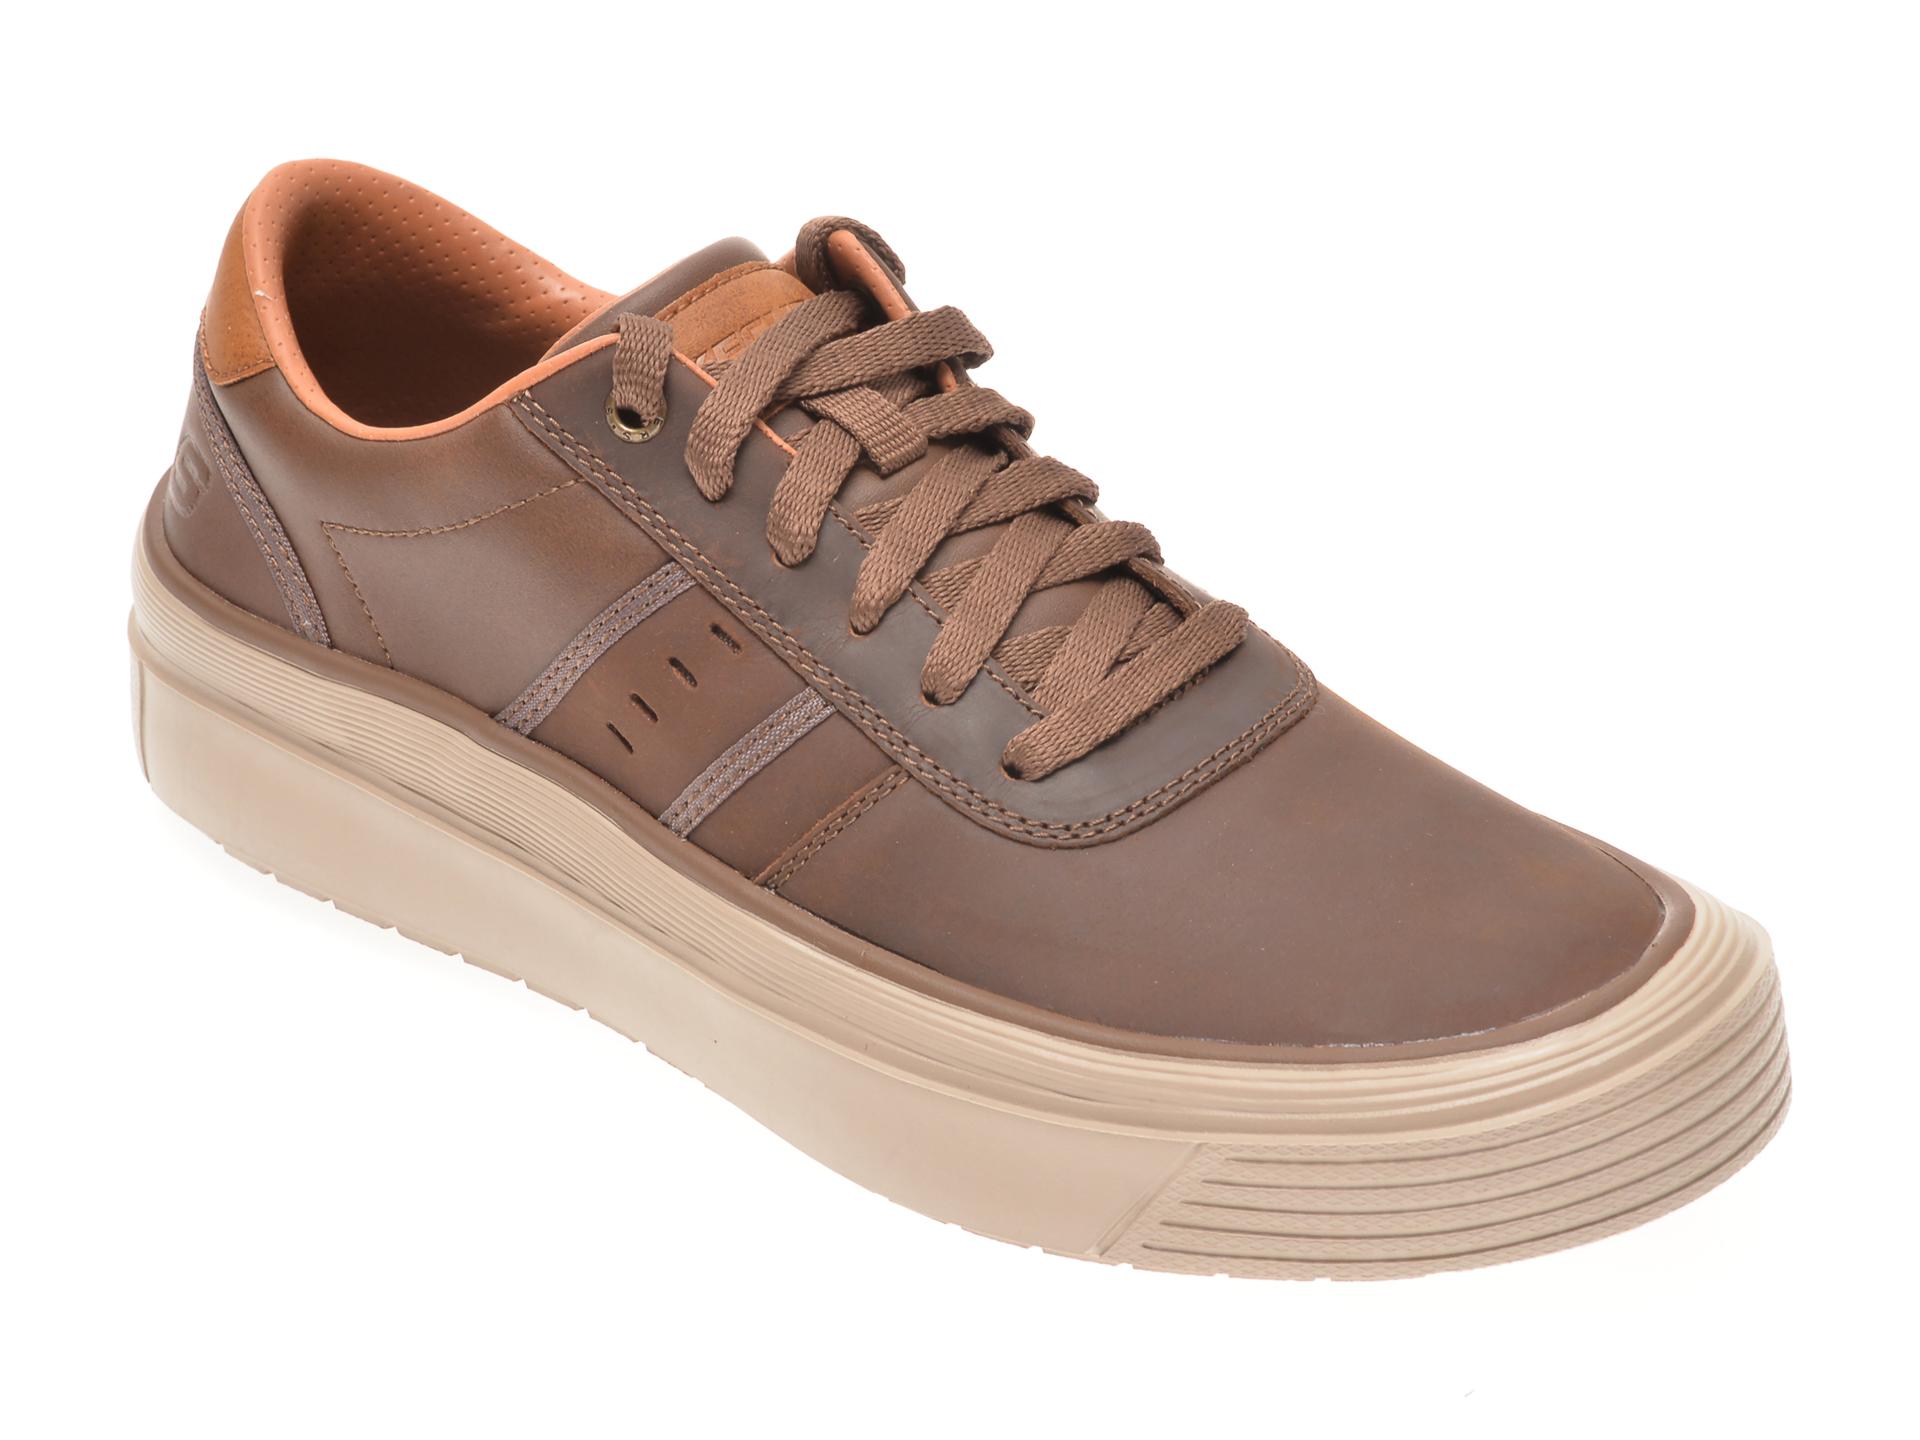 Pantofi SKECHERS maro, VIEWPORT BRAMBO, din piele naturala imagine